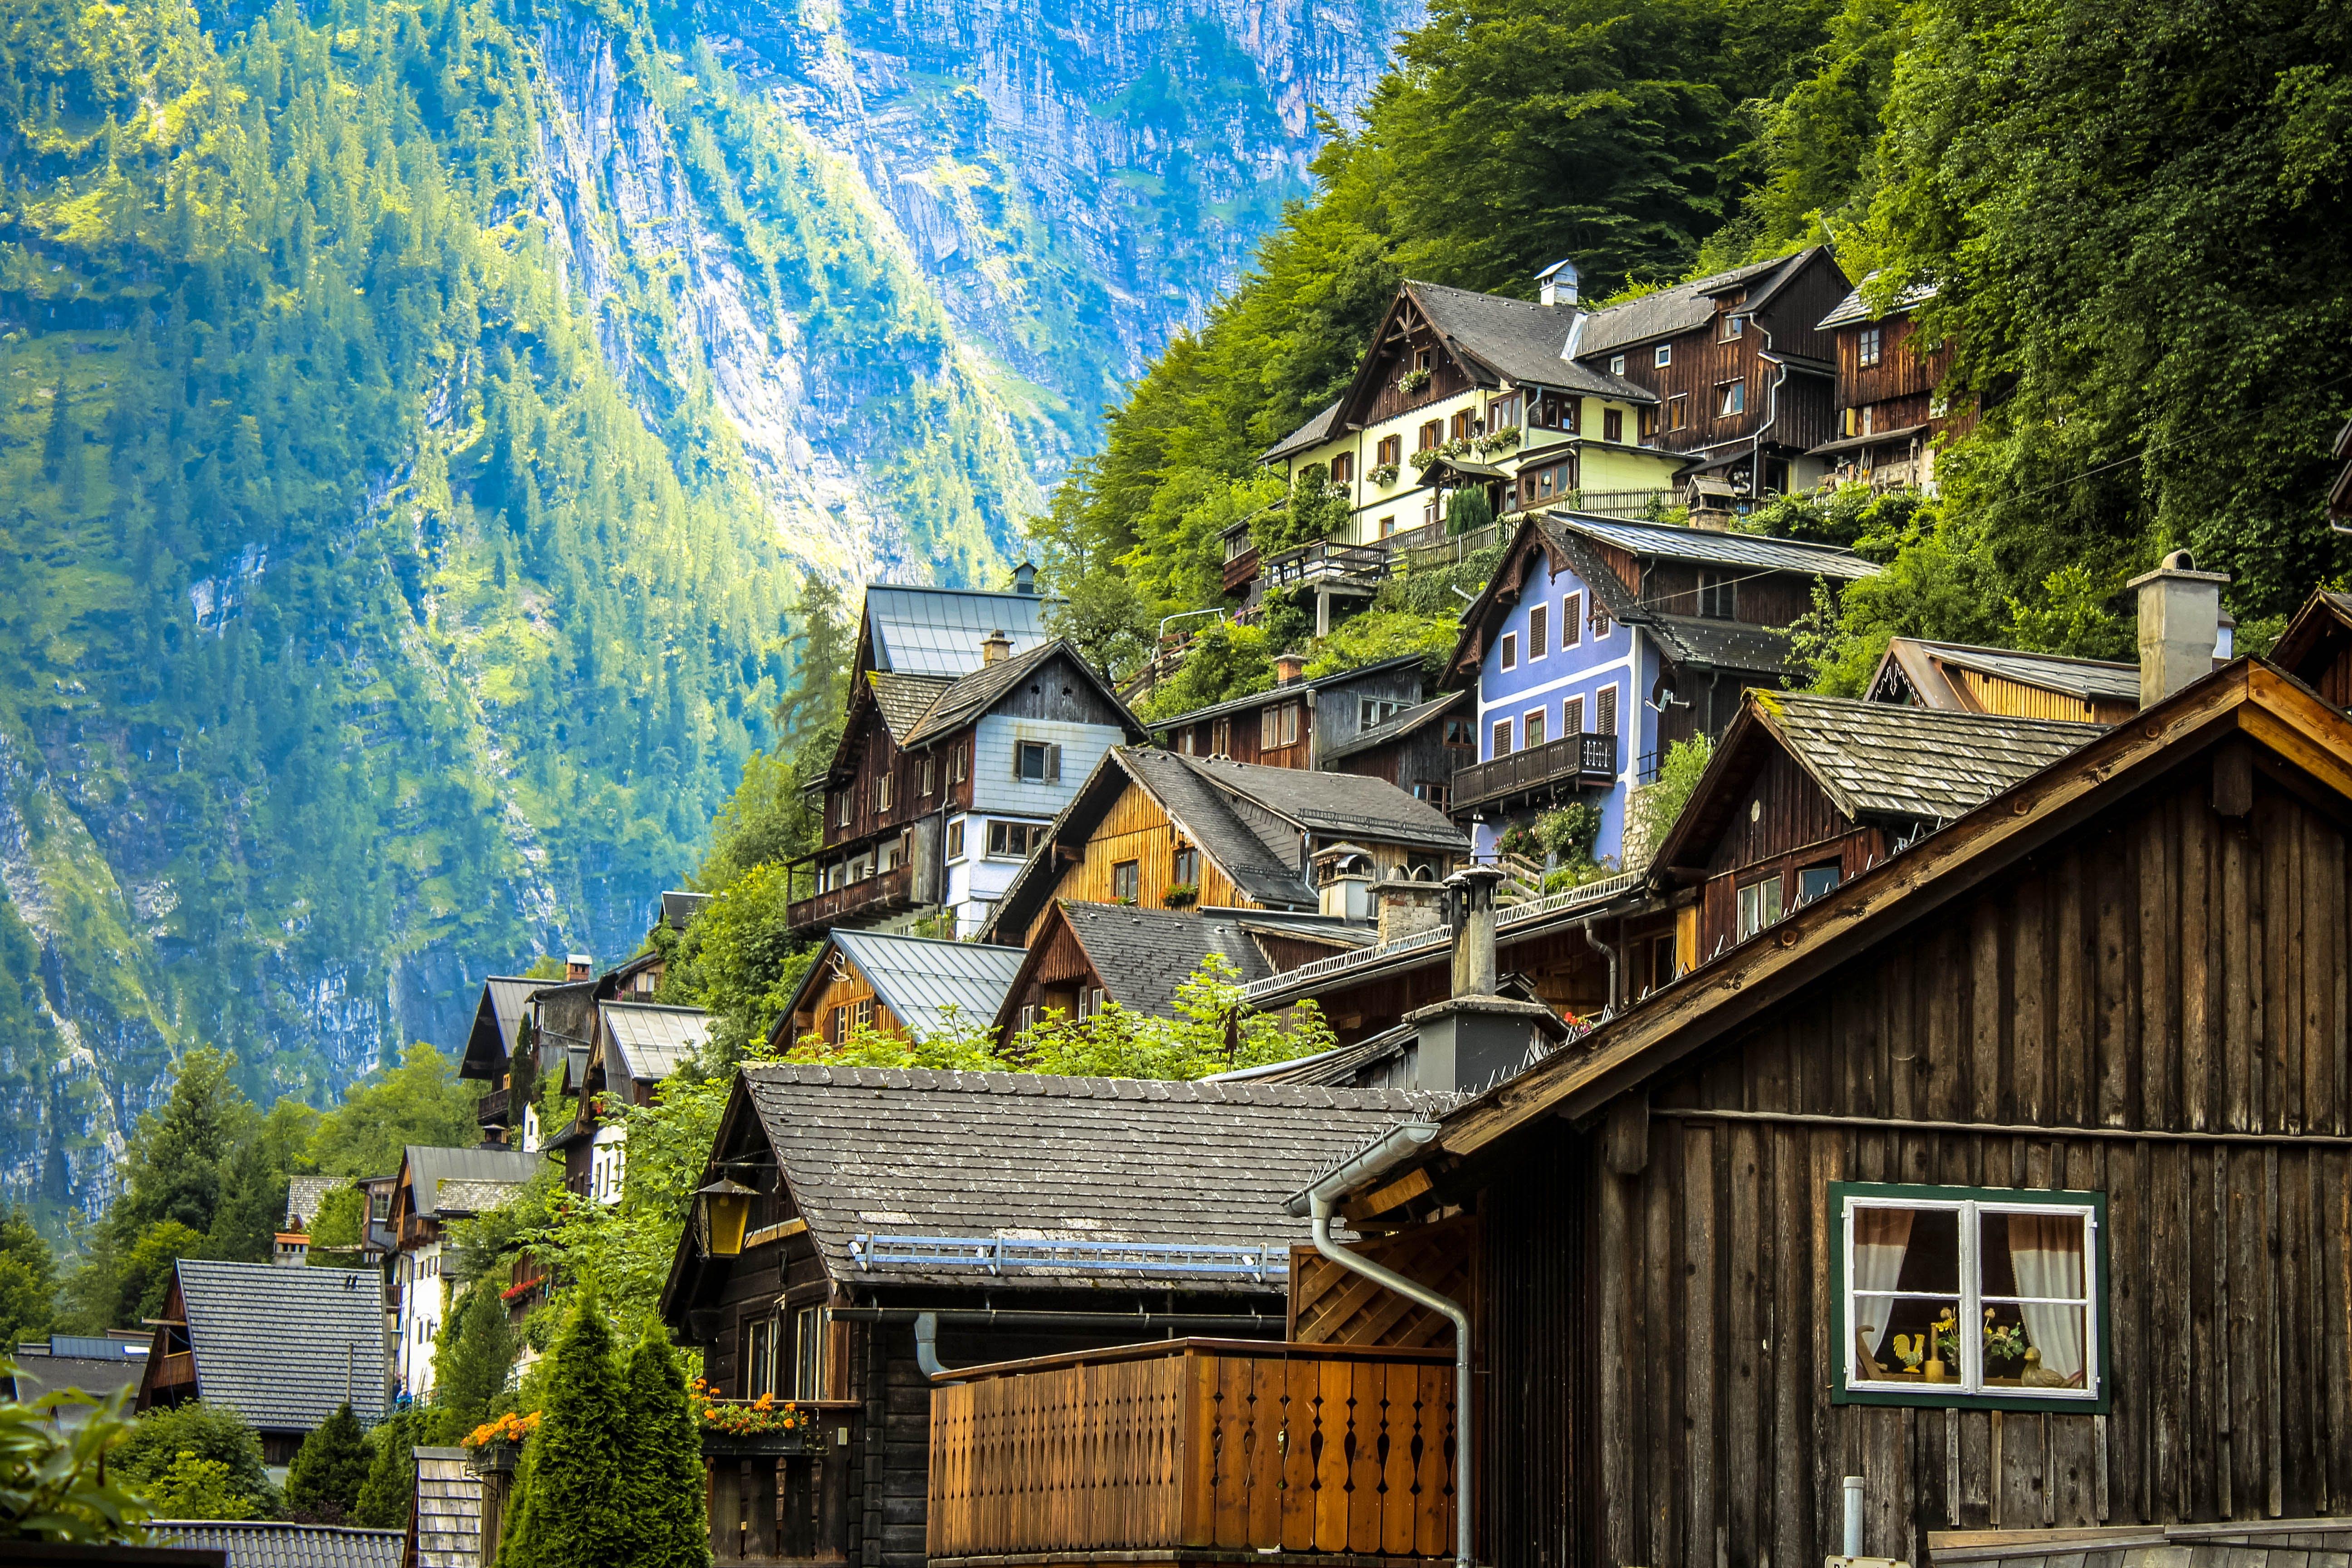 Houses Near the Mountain